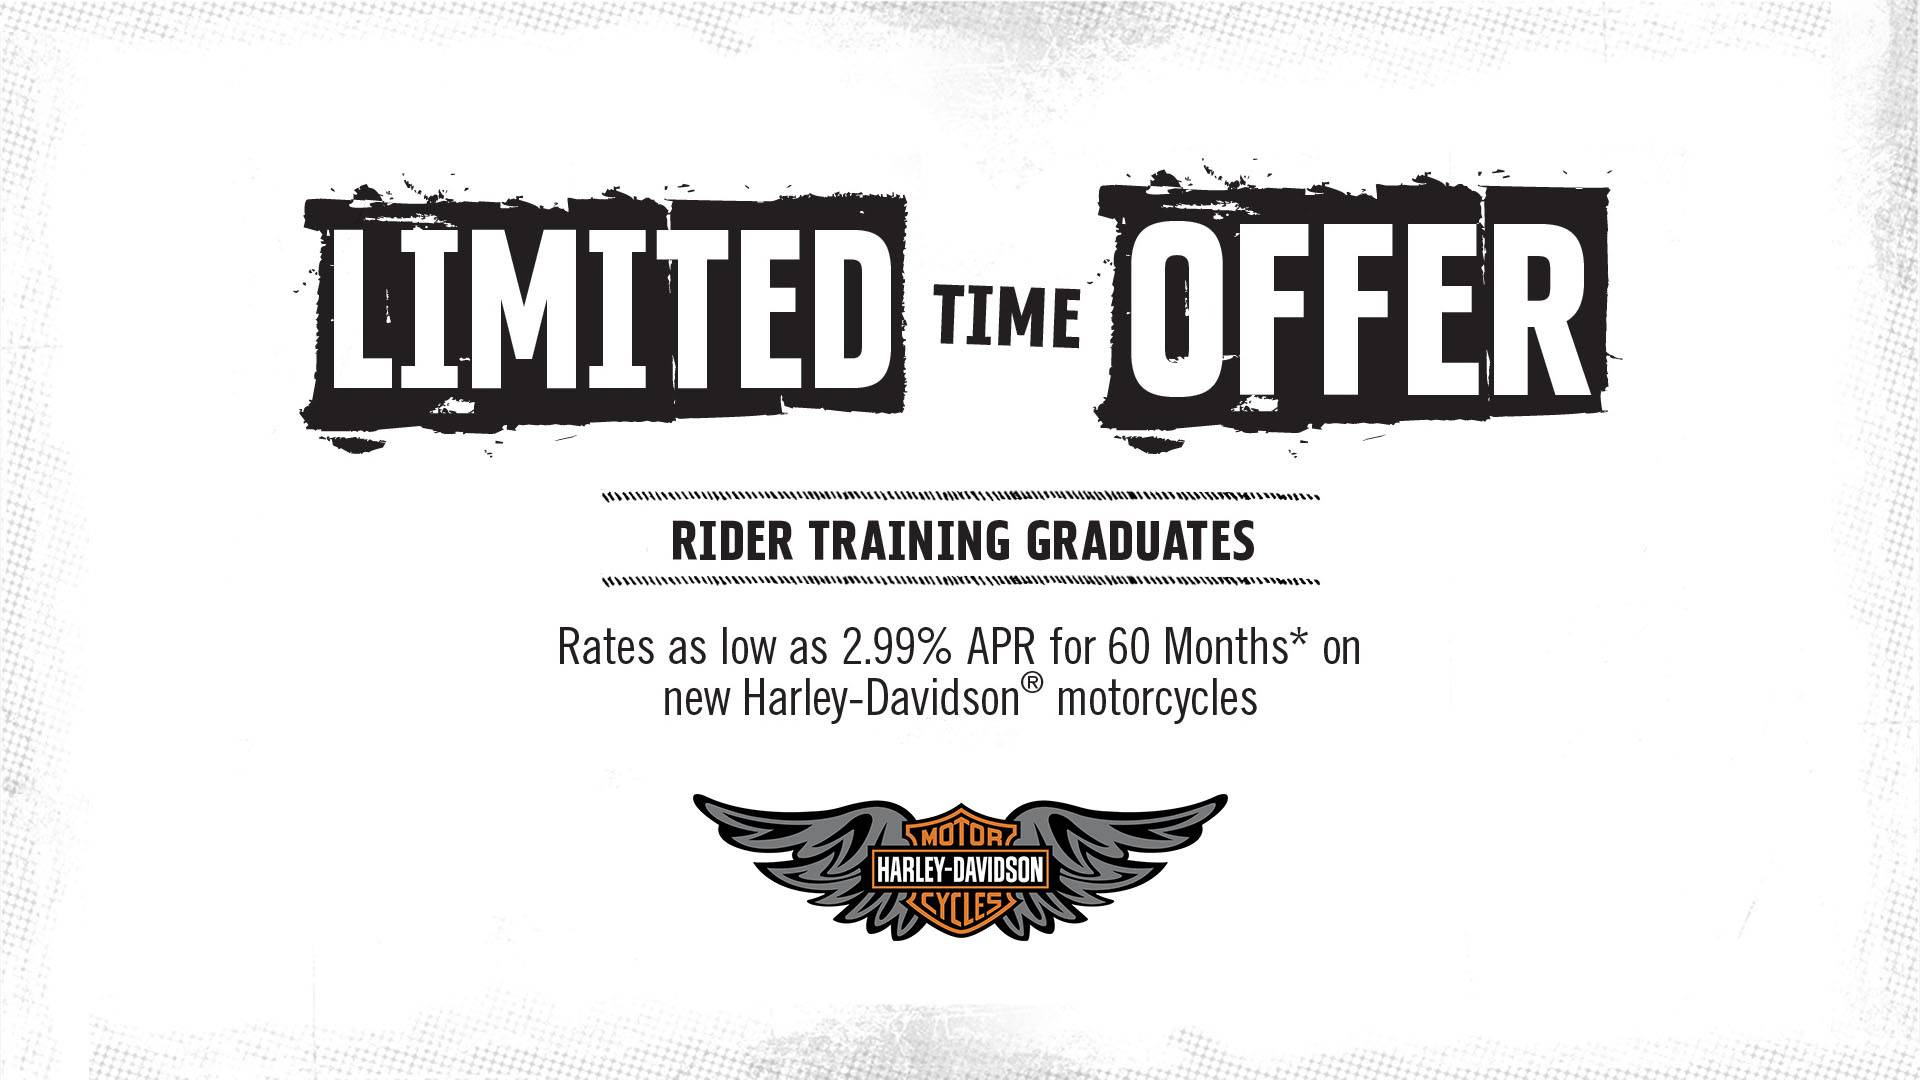 Harley-Davidson - Rider Training Graduate Program